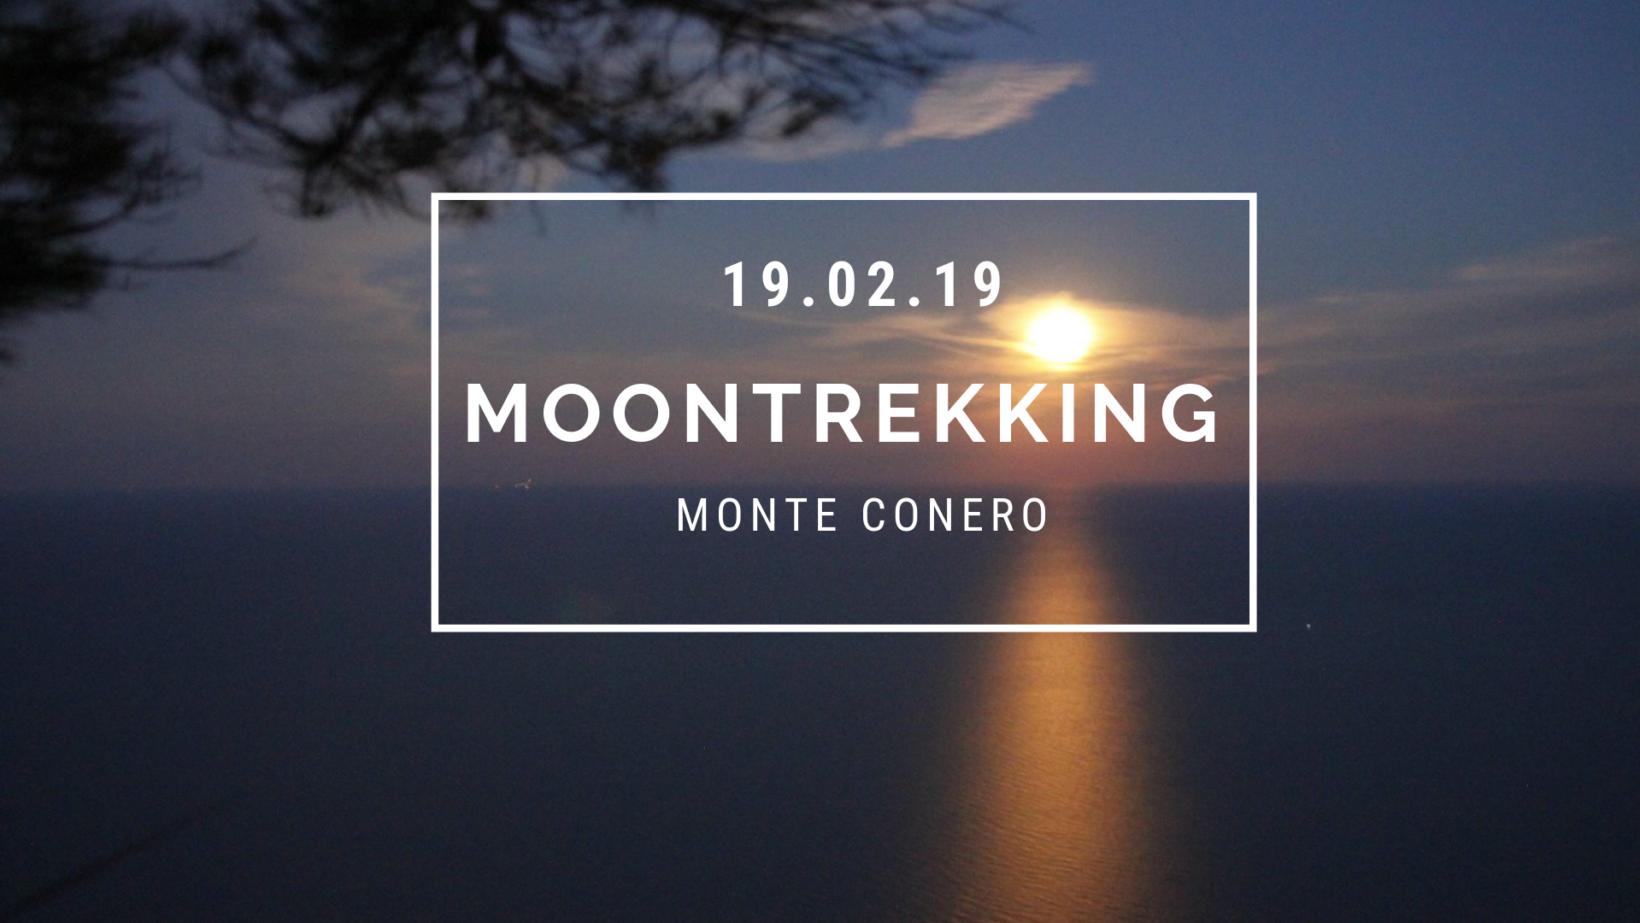 Moon trekking: Super Luna al Conero